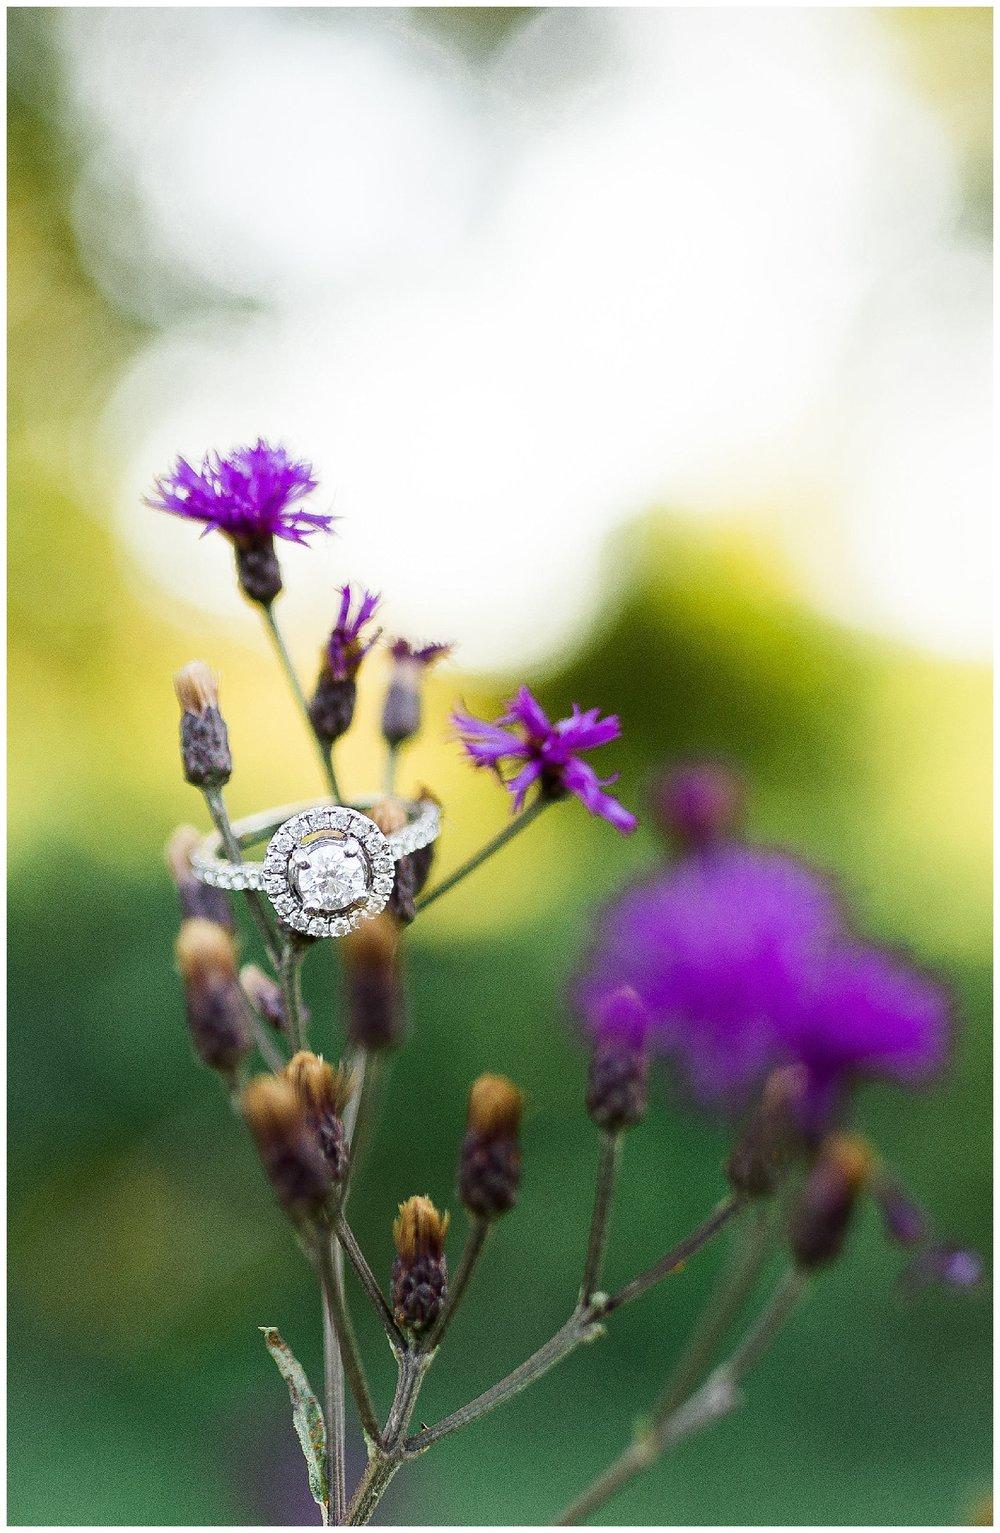 everleigh-photography-cincinnati-wedding-photographer-best-moments-of-2016-cincinnati-wedding-cincinnati-weddings-90